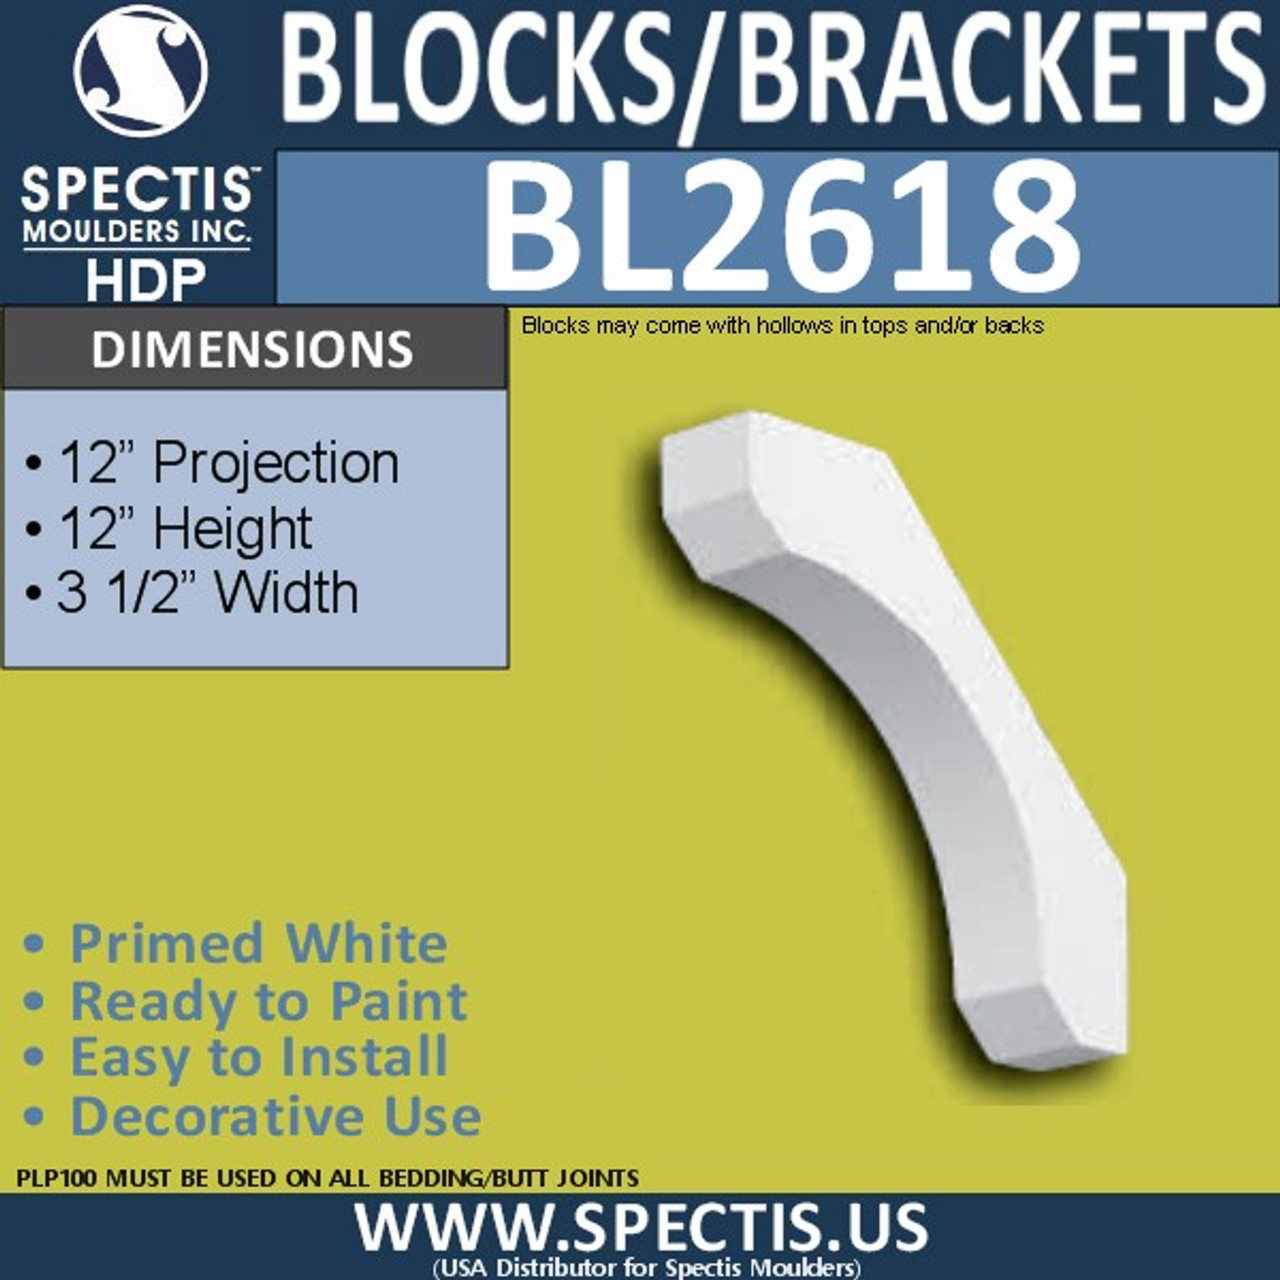 "BL2618 Eave Block or Bracket 3.5""W x 12""H x 12"" P"